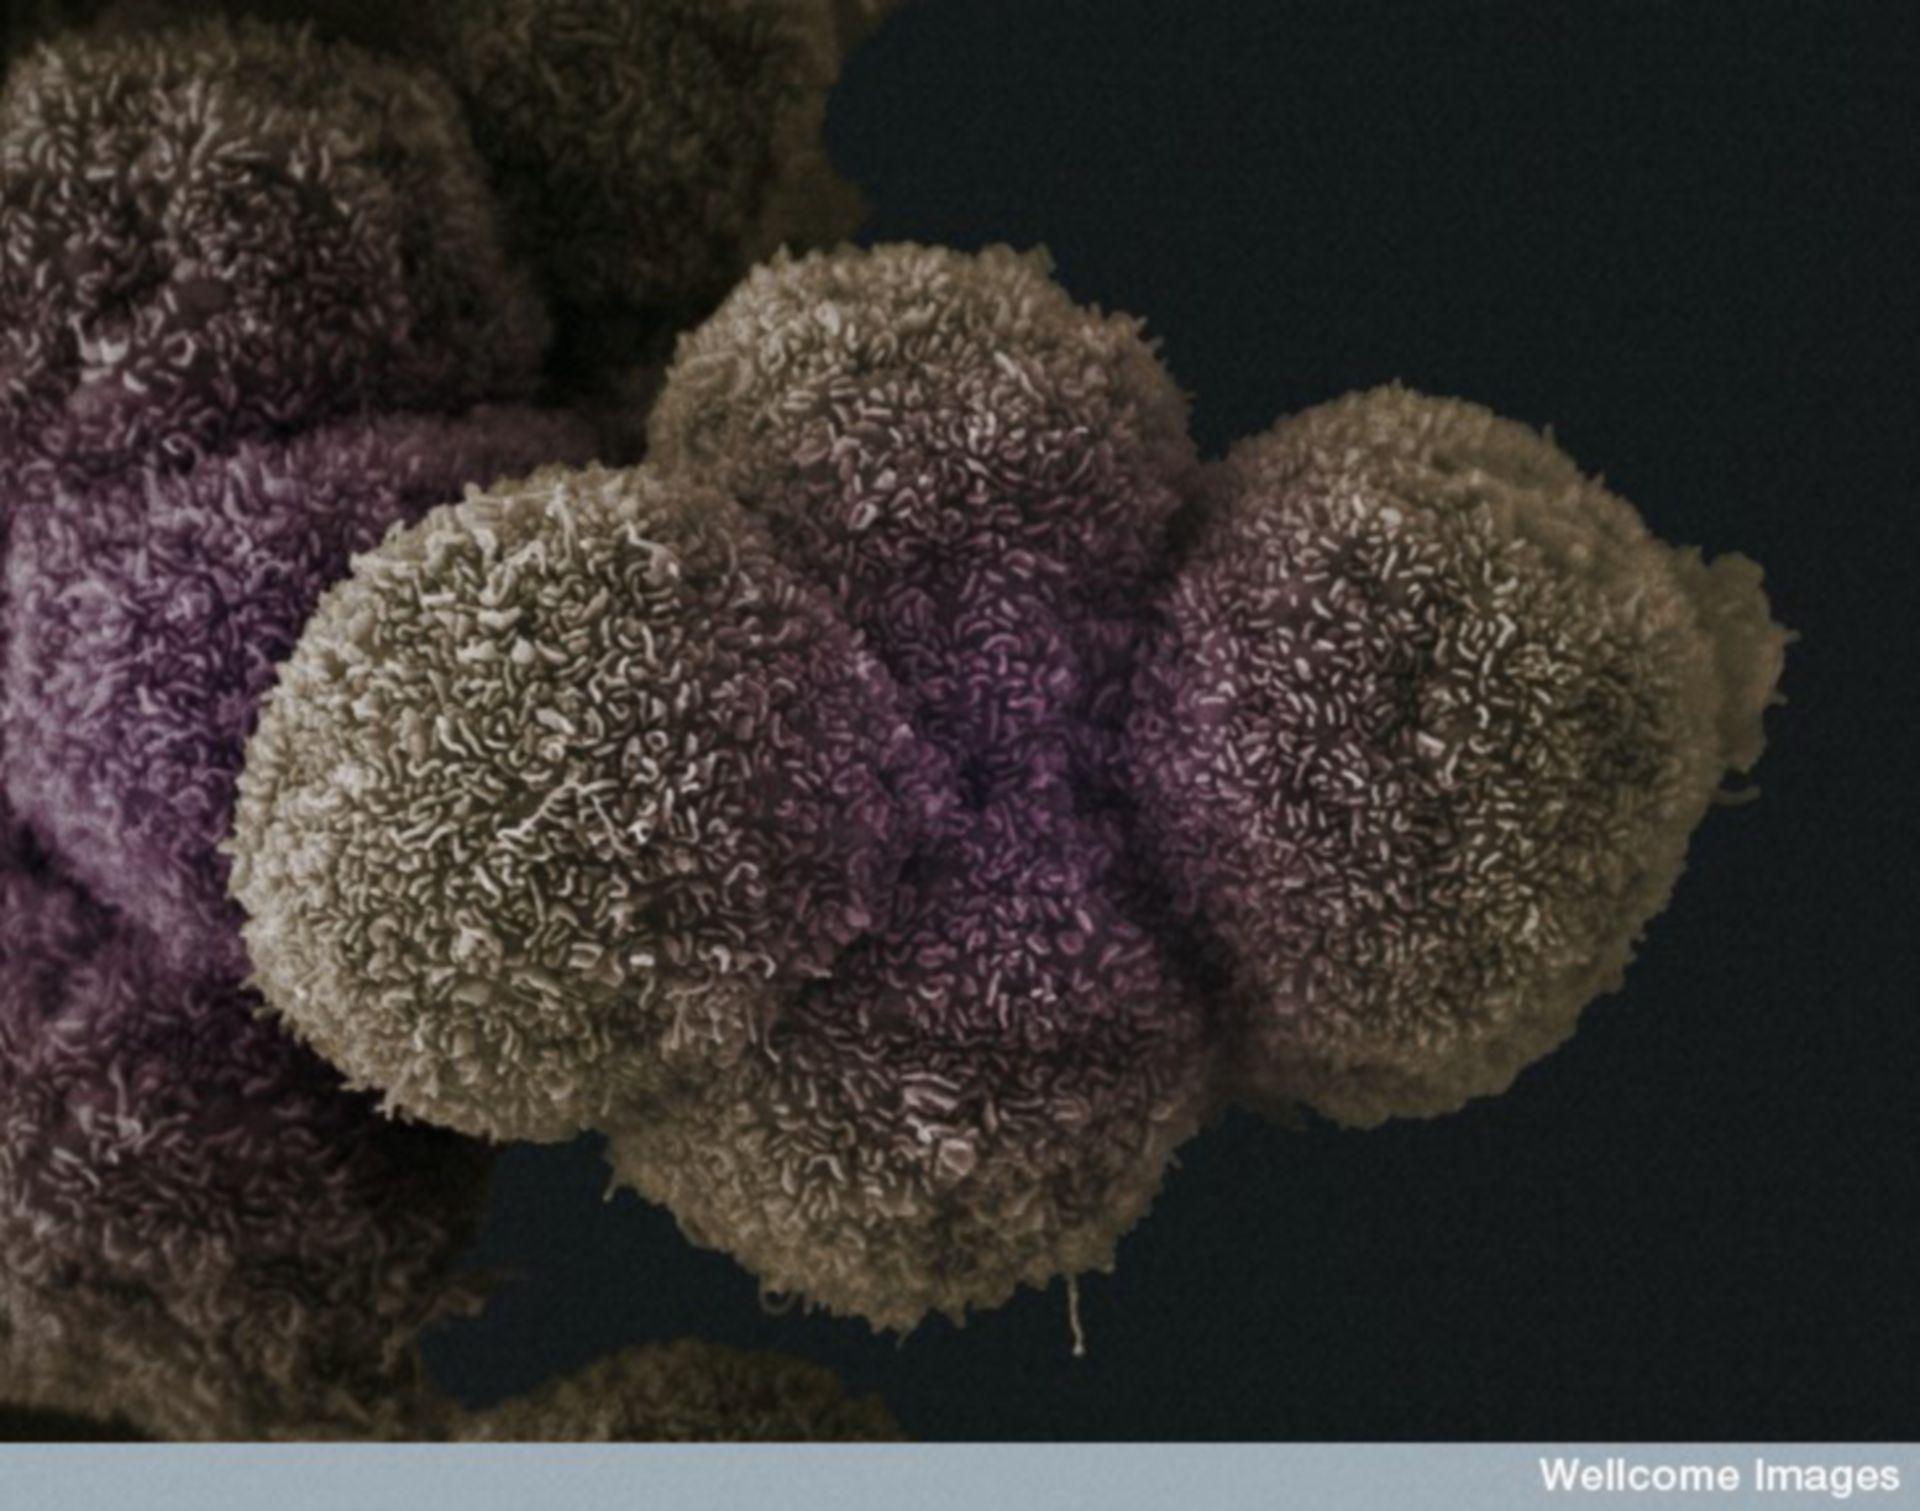 The Cell - Bild der Woche (06.04.2015) / Krebszellen